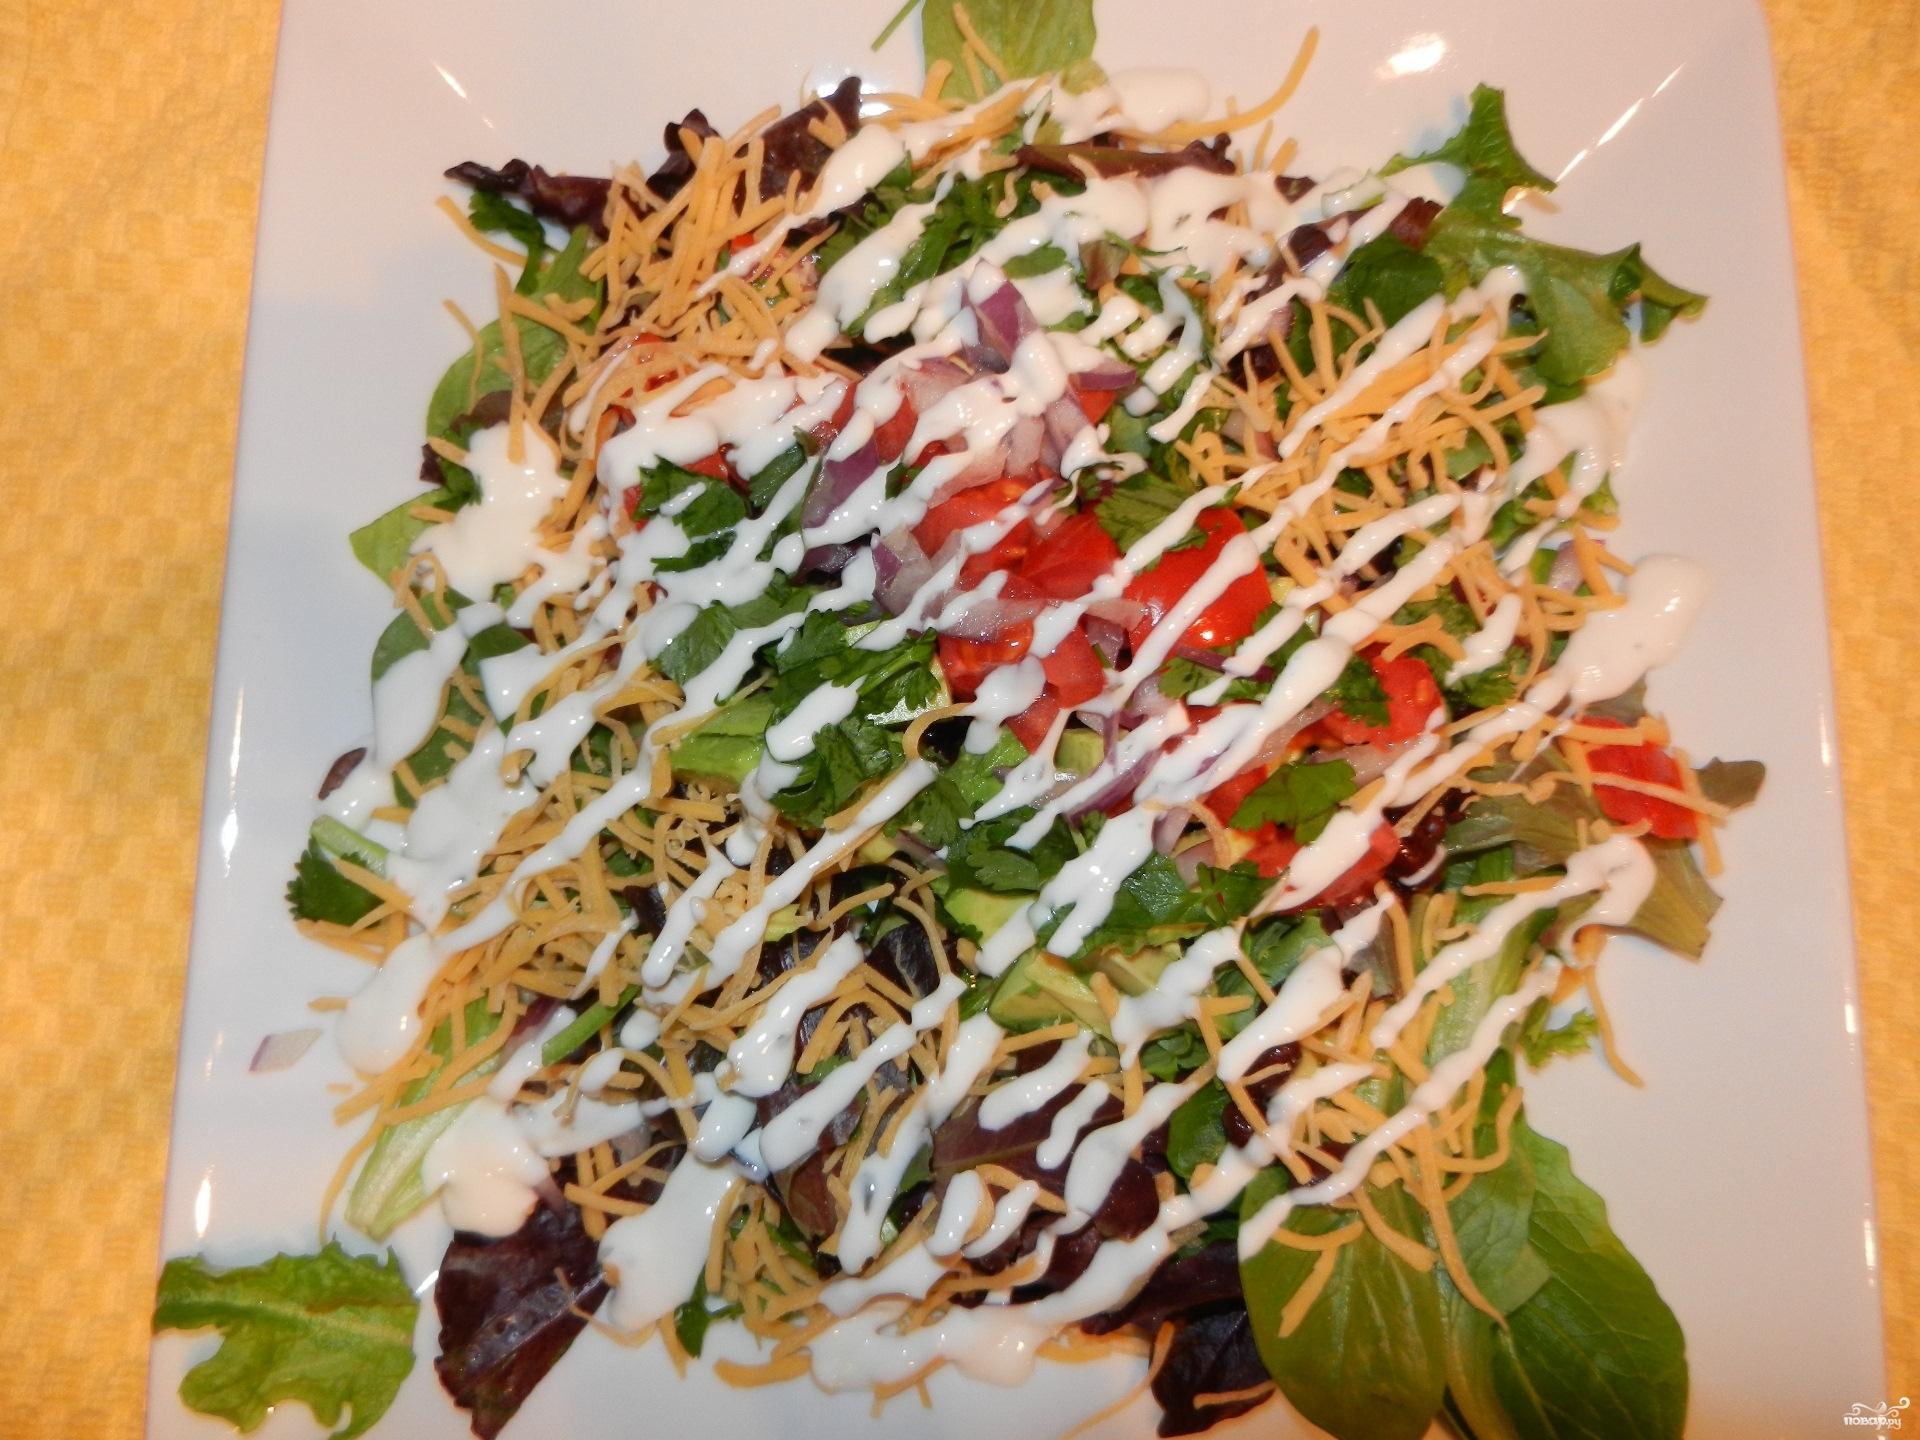 салаты с майонезом рецепты на поваренок